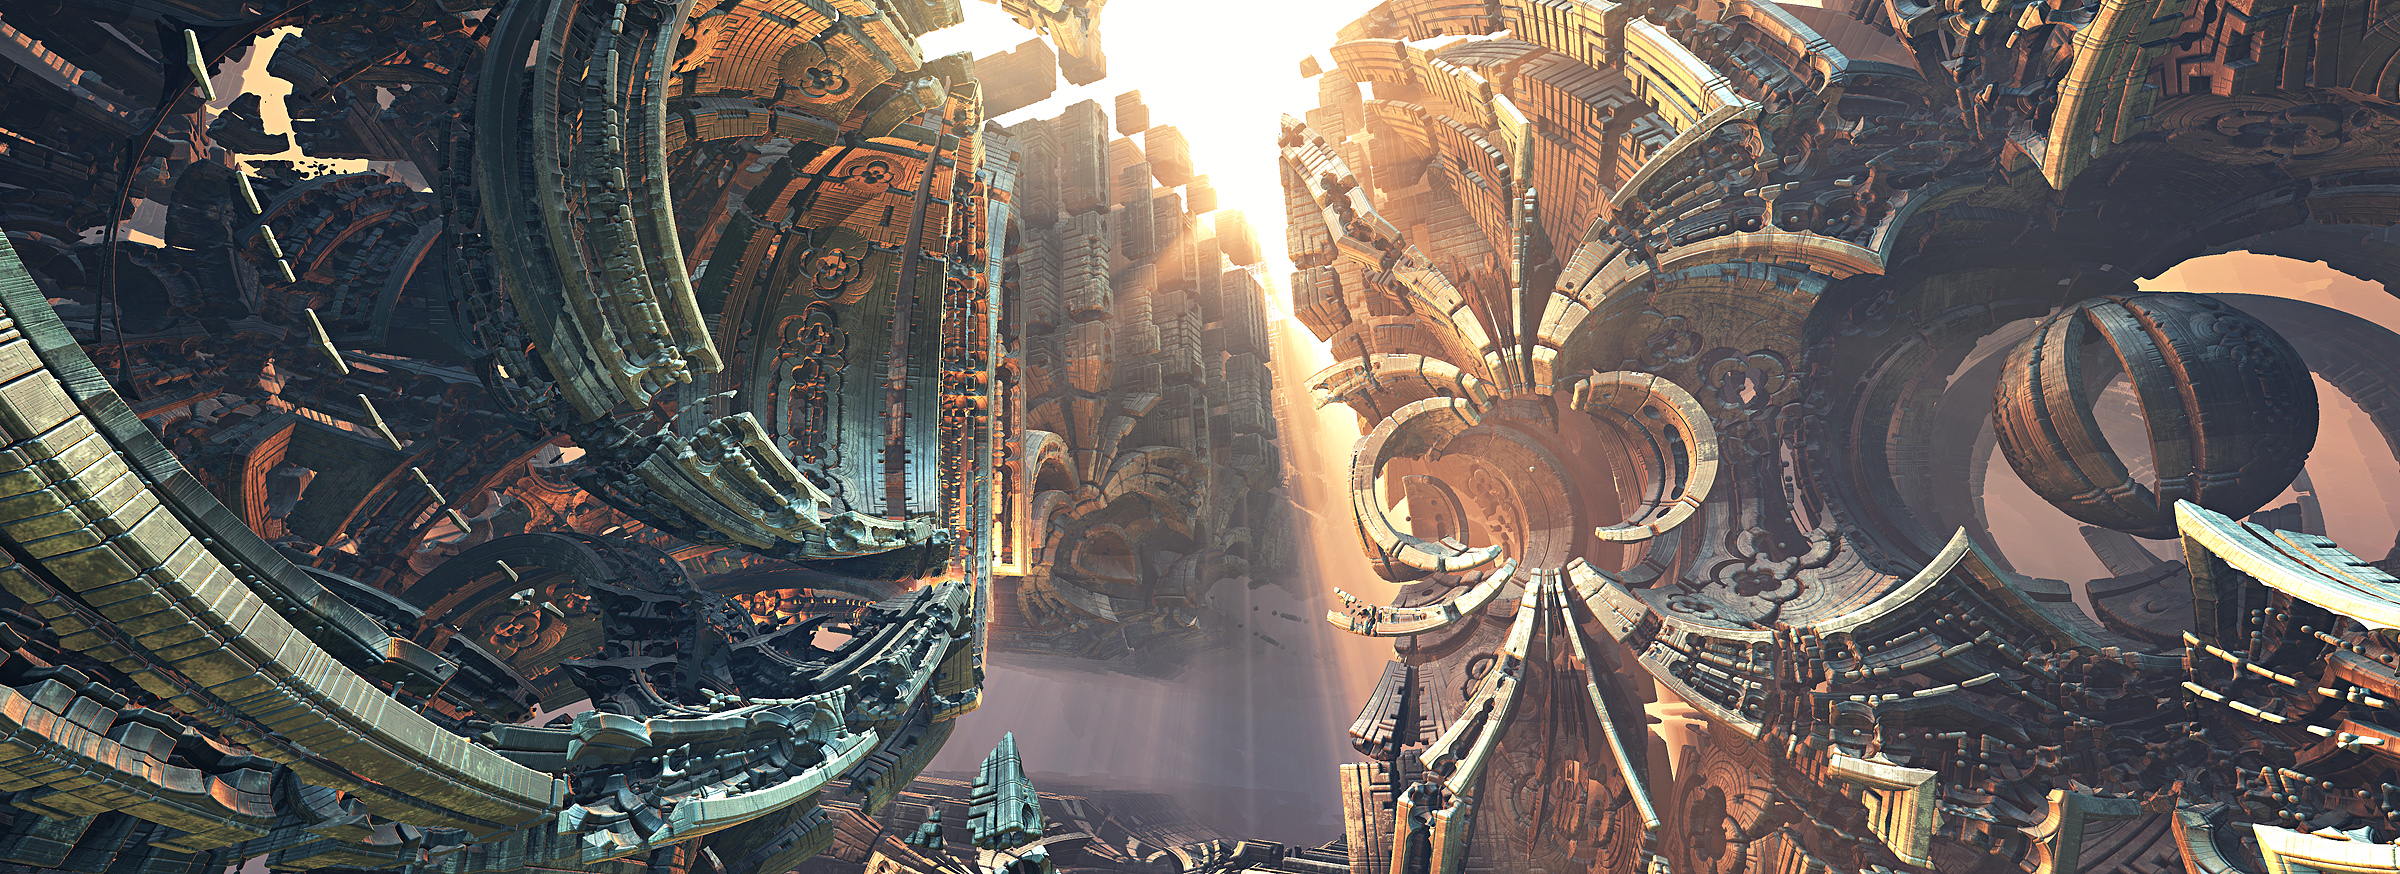 Spaceship Scrapyard